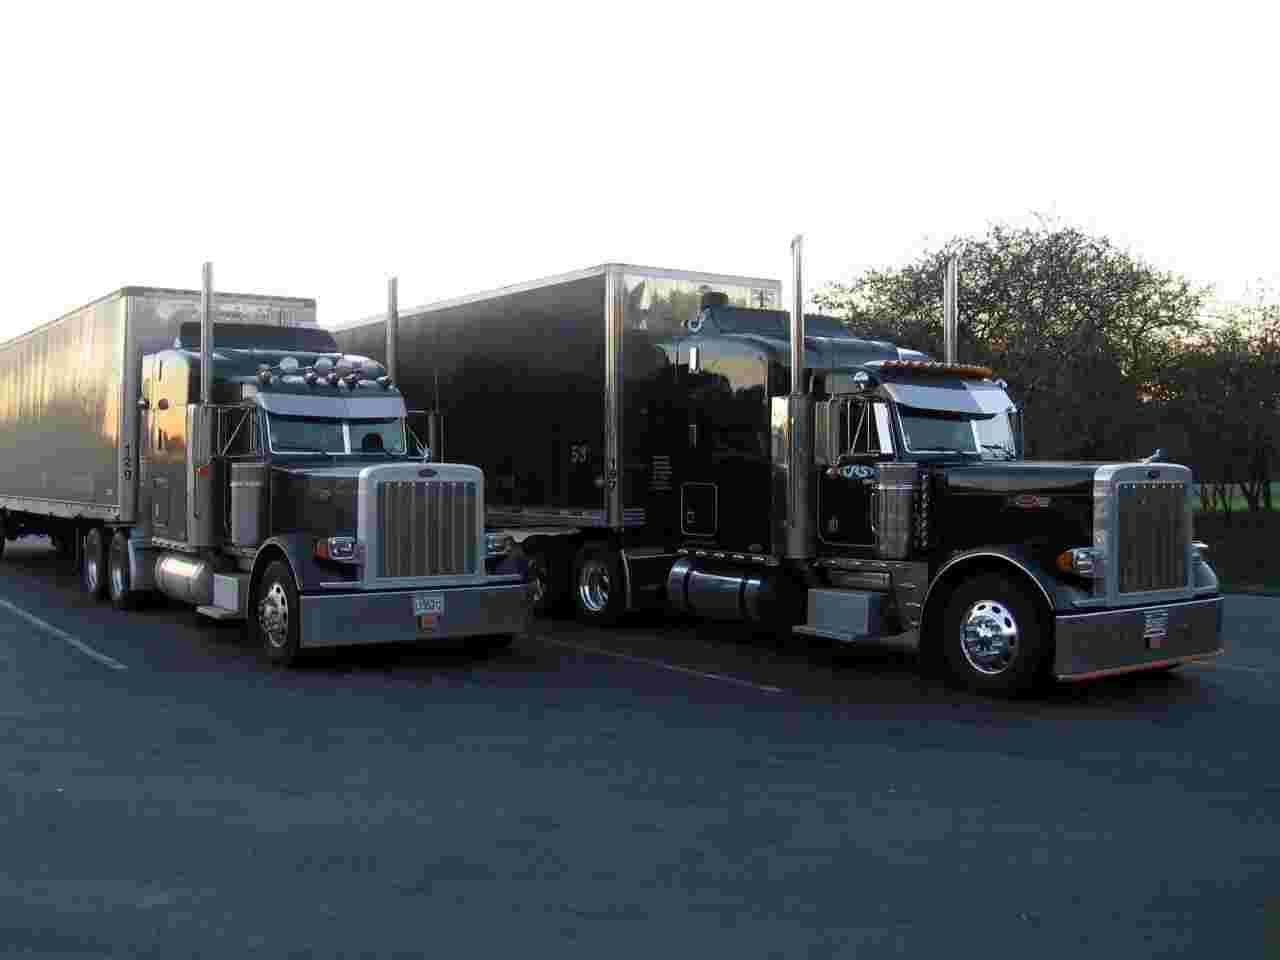 Peterbuilt peterbilt 379 peterbilt peterbilt truck peterbilt trucks